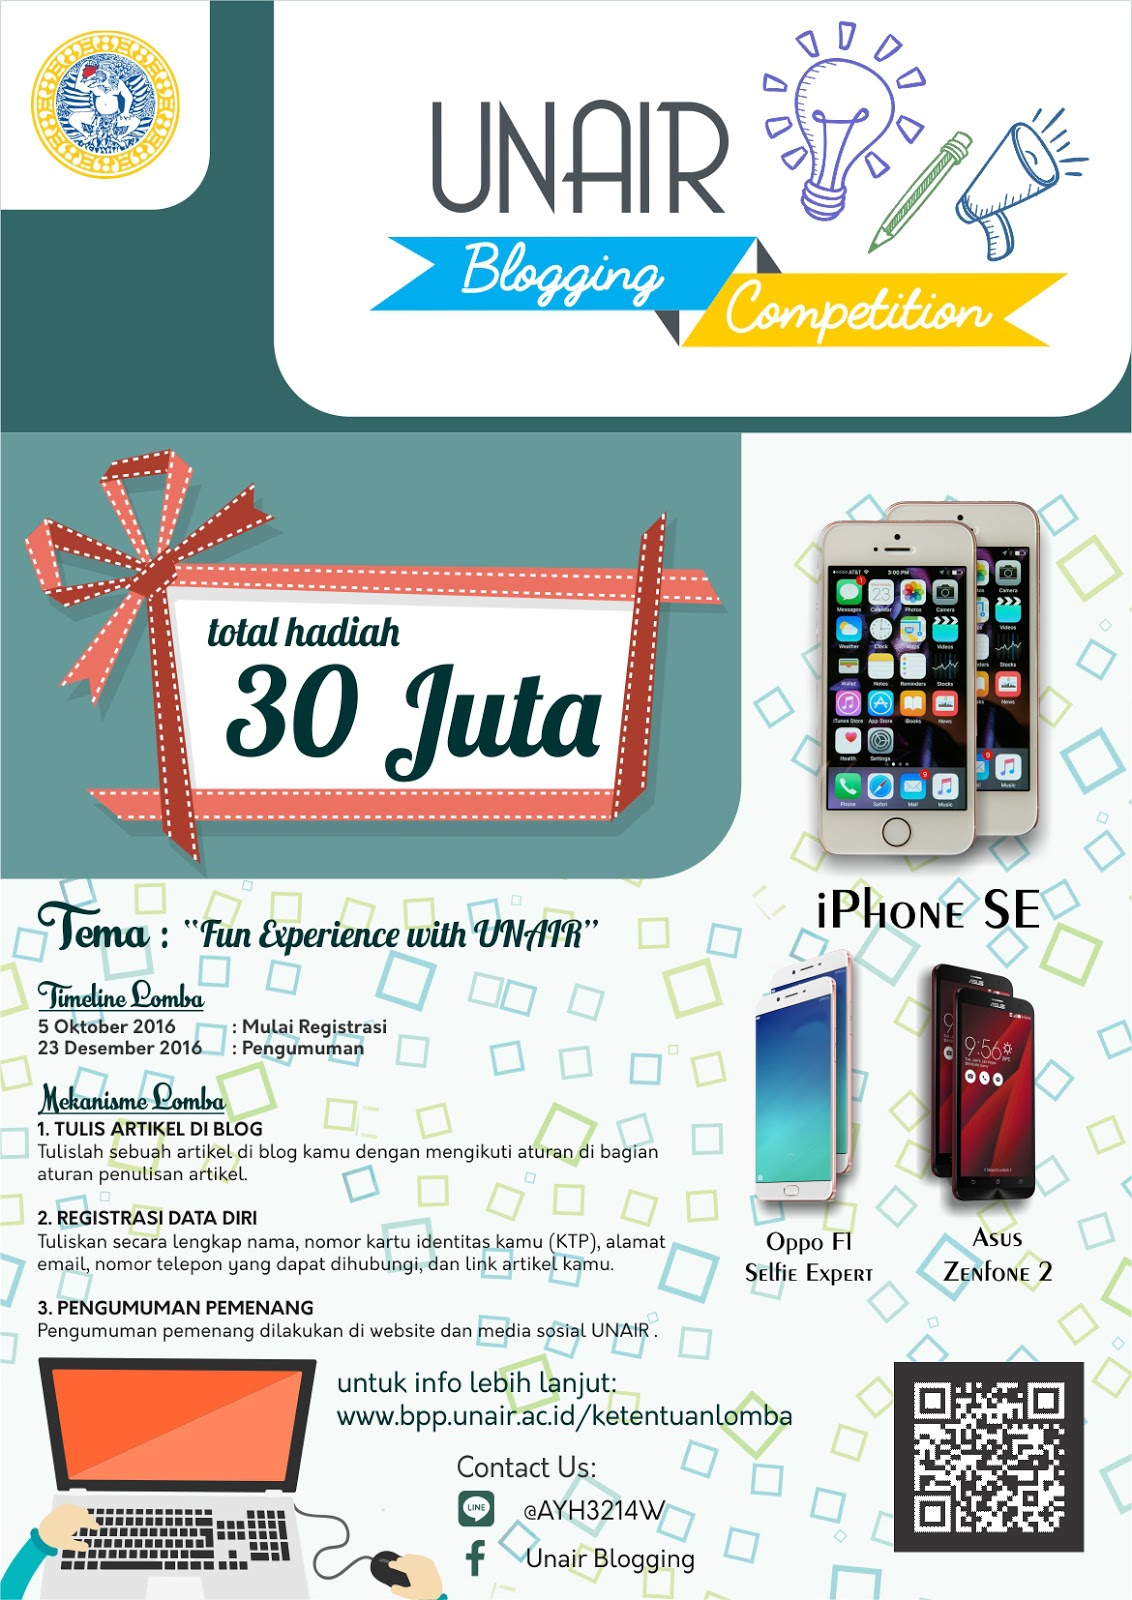 Unair Blogging Competition 2016